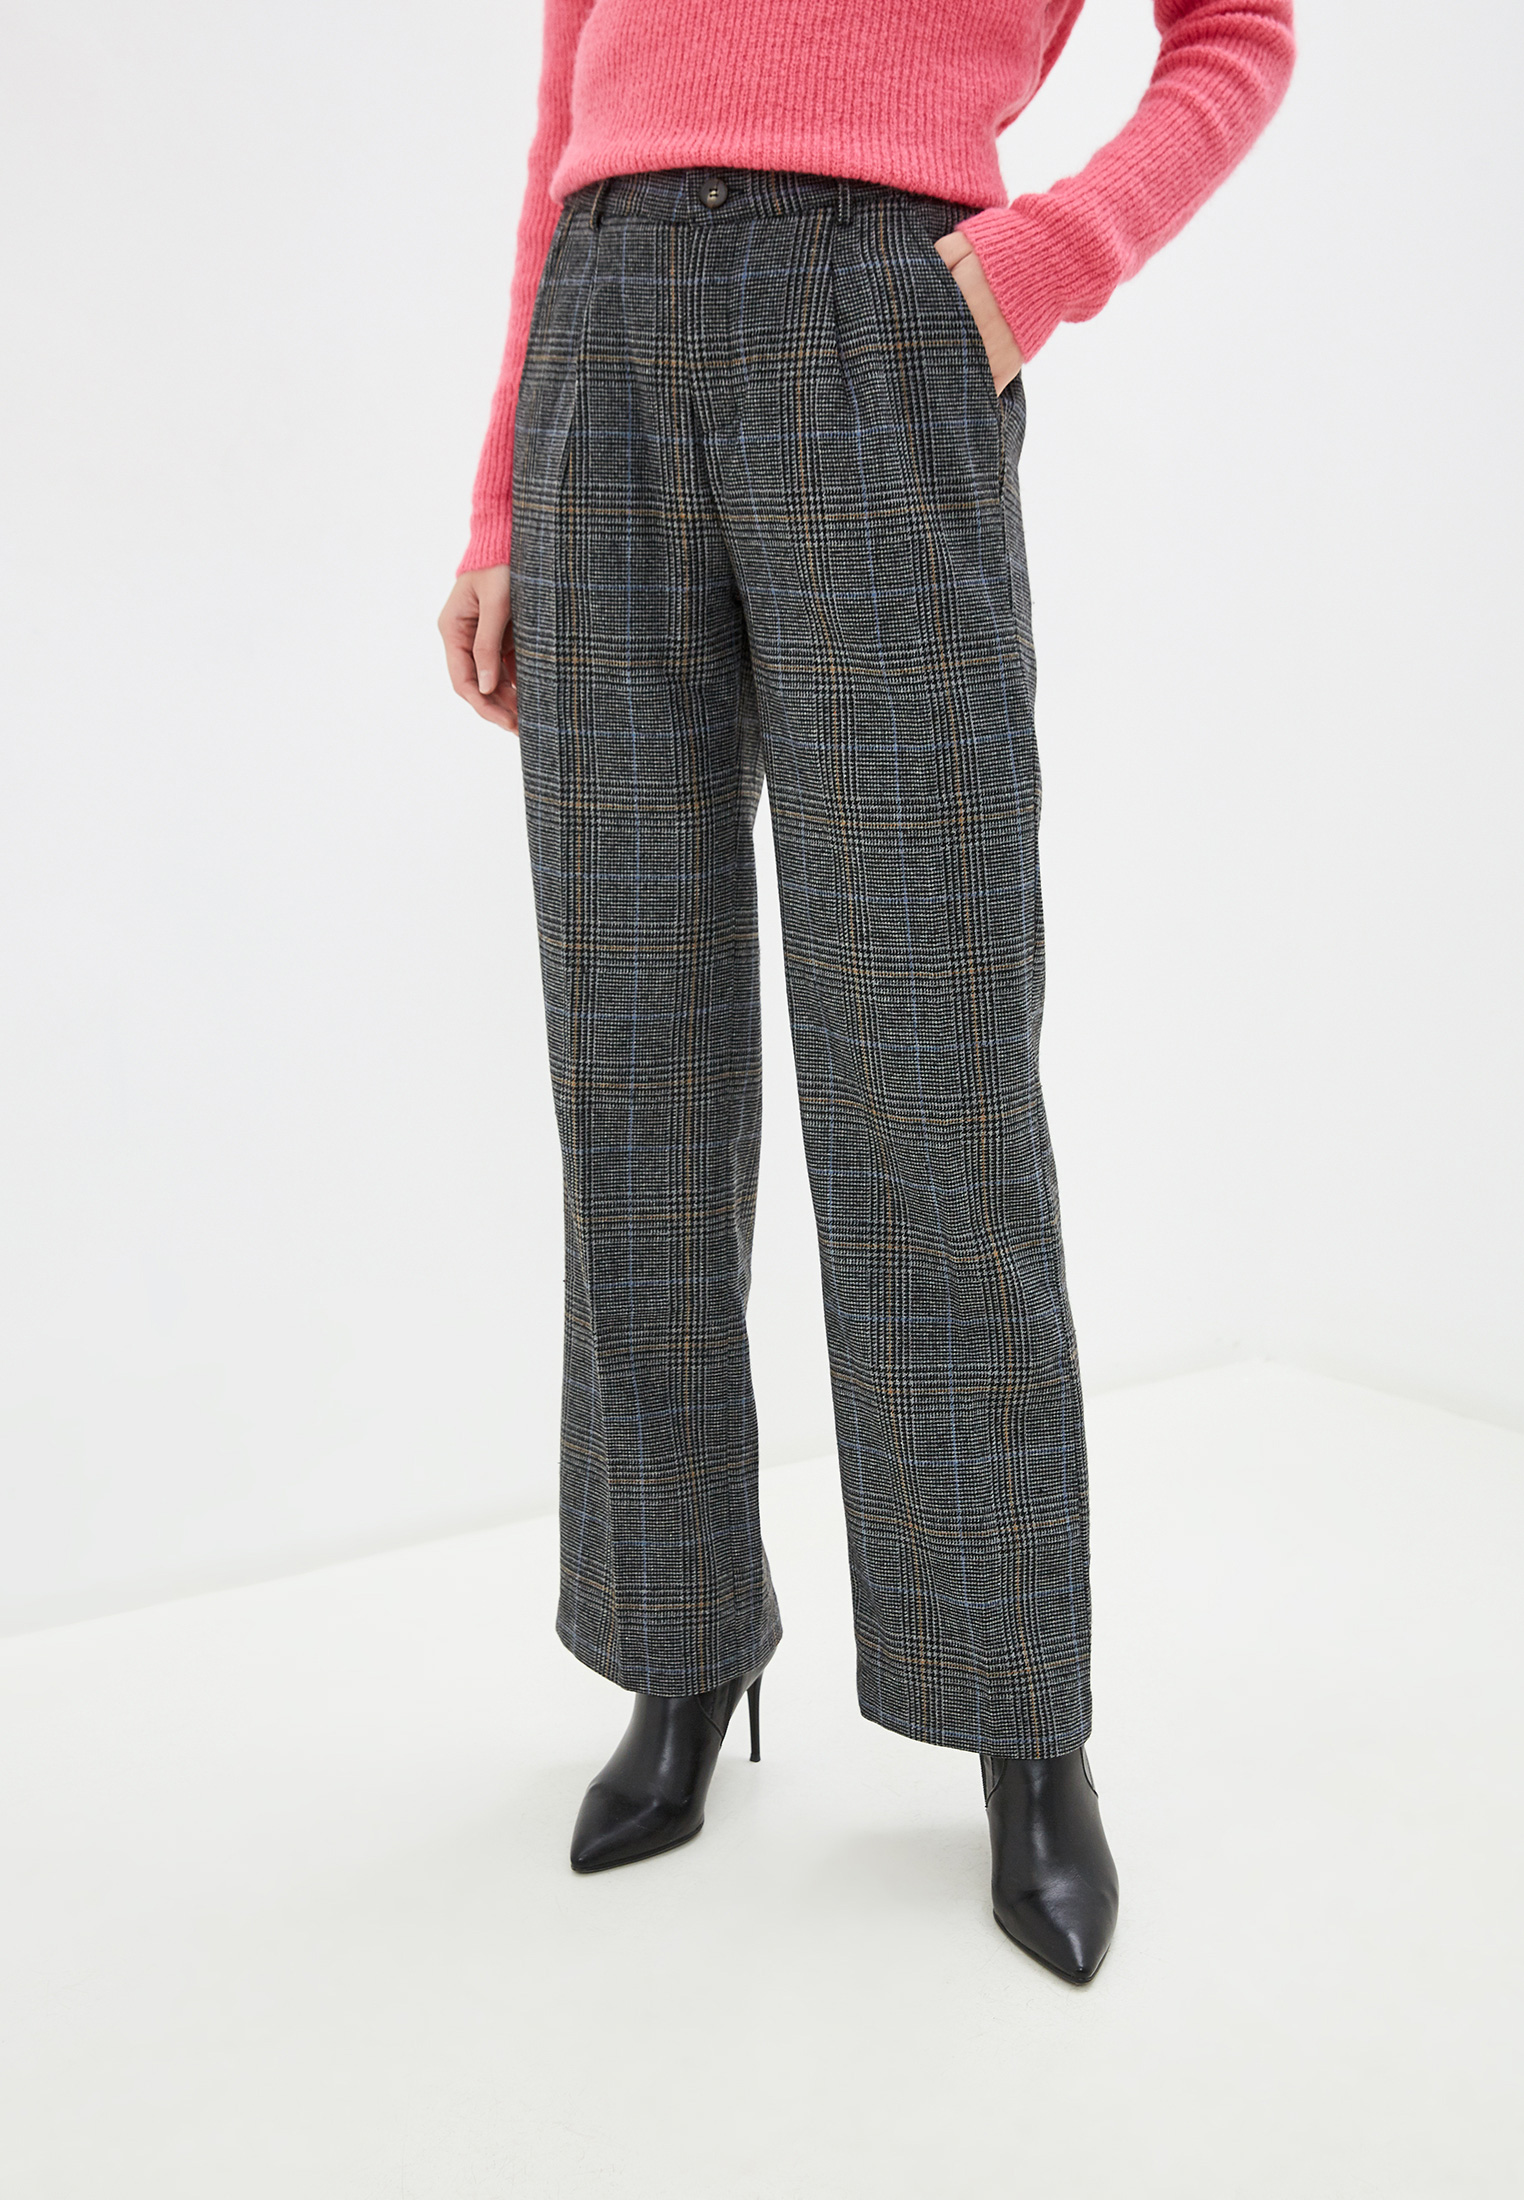 Женские классические брюки Sparkz Copenhagen 93-01580-05-252